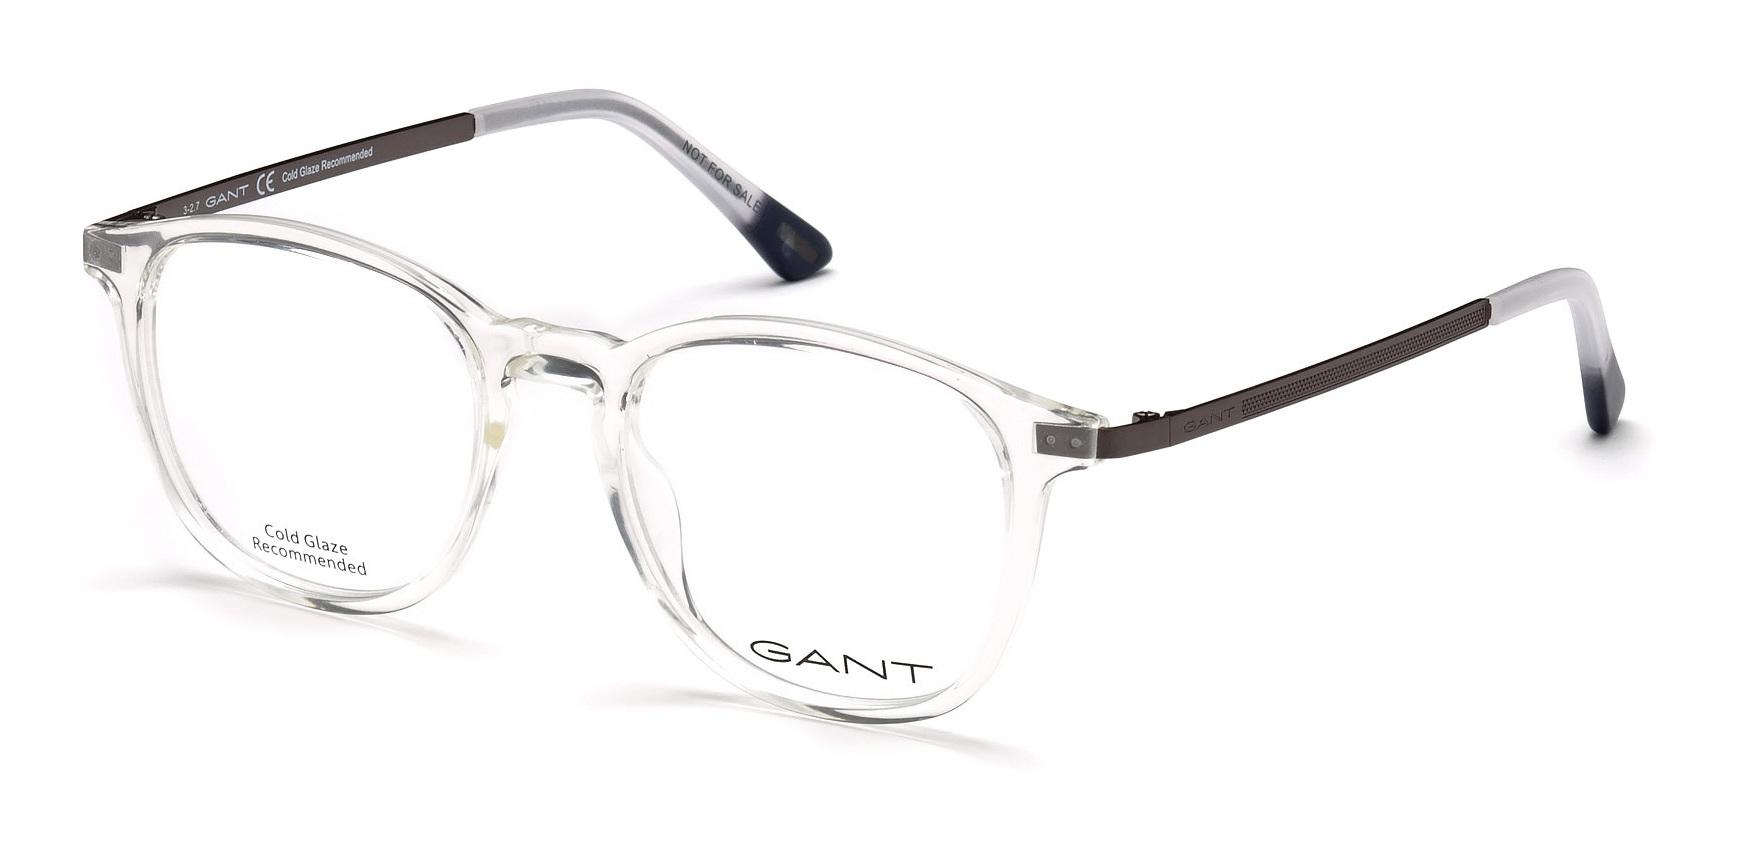 Gant Ga3174